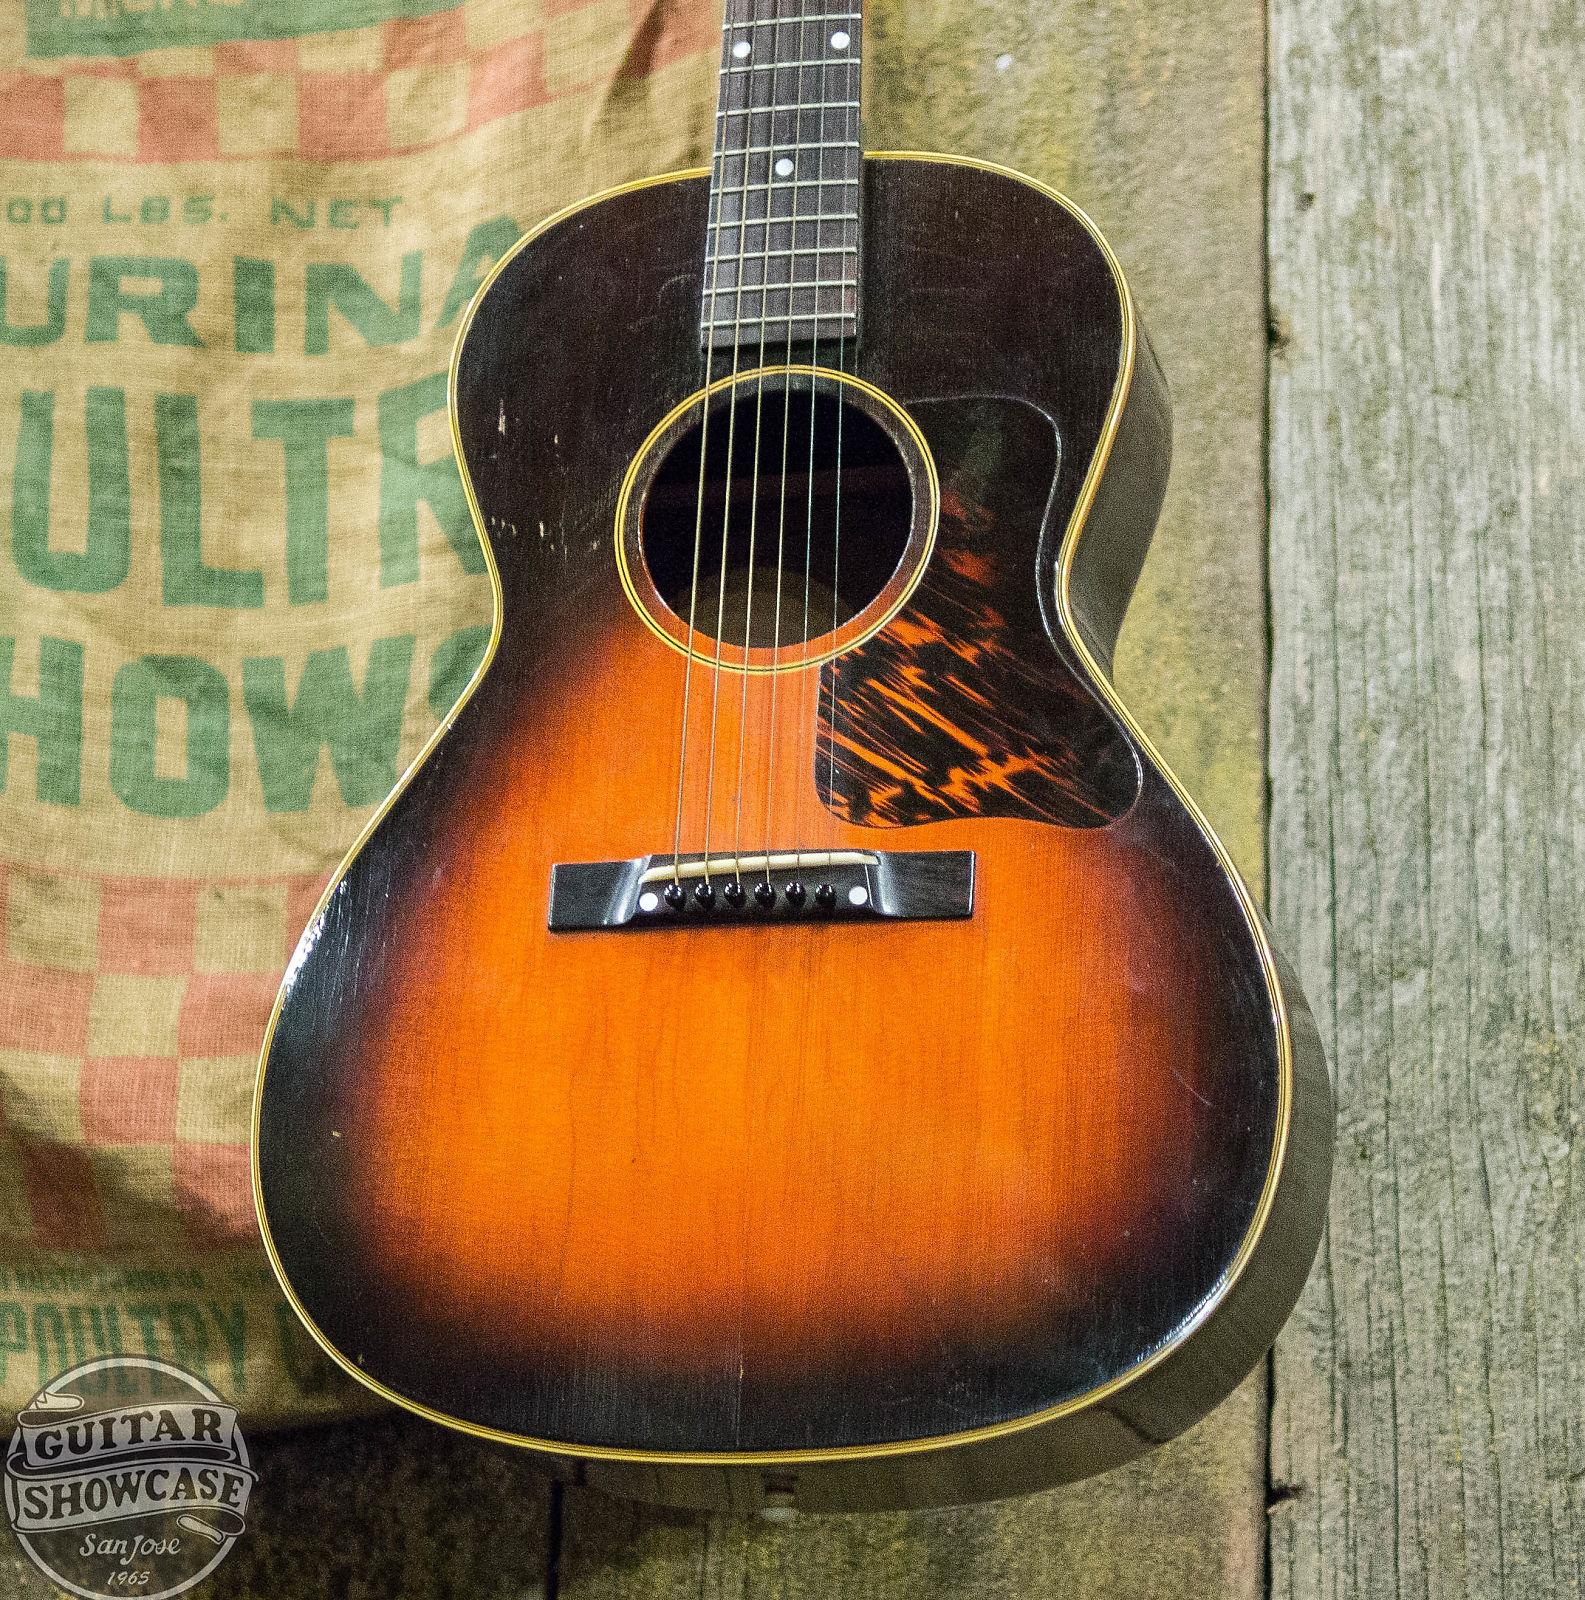 21feda87797 Gibson 1942 L-00 Vintage Acoustic Guitar Sunburst $5995 Very Good